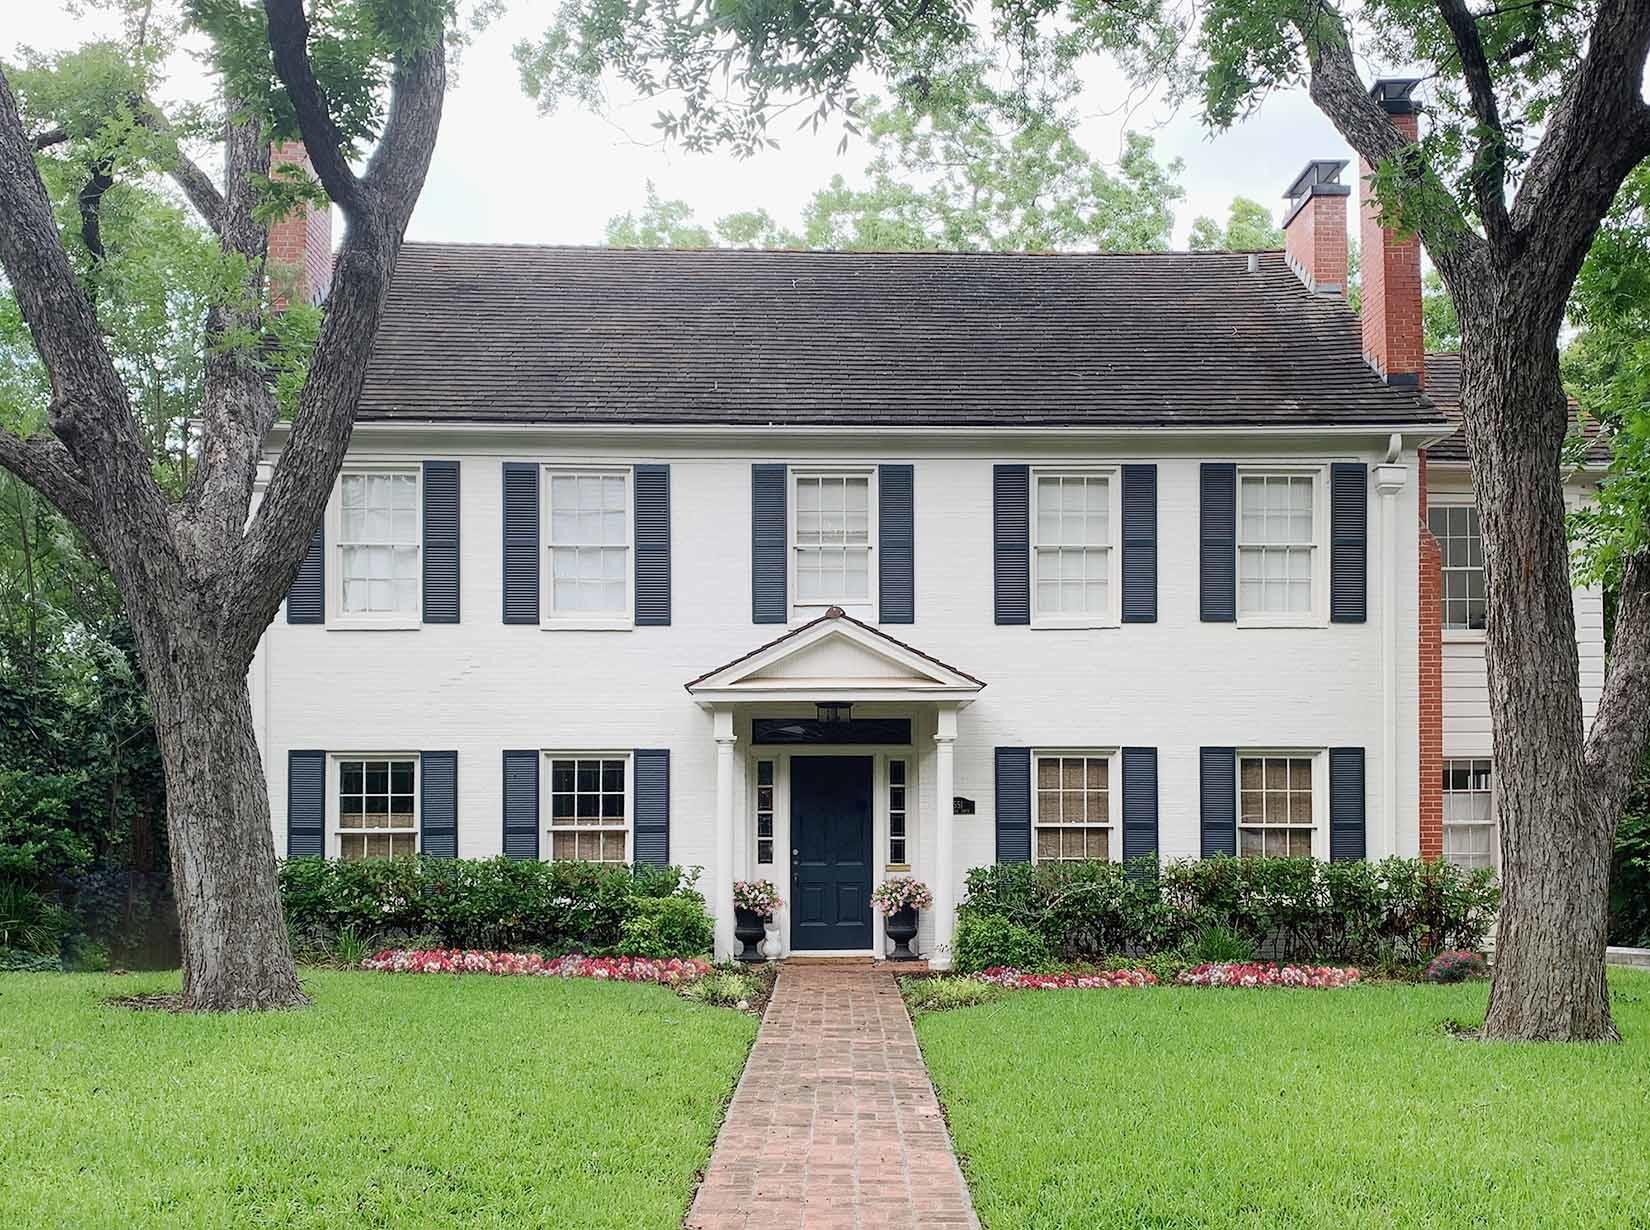 House exterior in Sherwin Williams Shoji White, San Antonio TX home painting